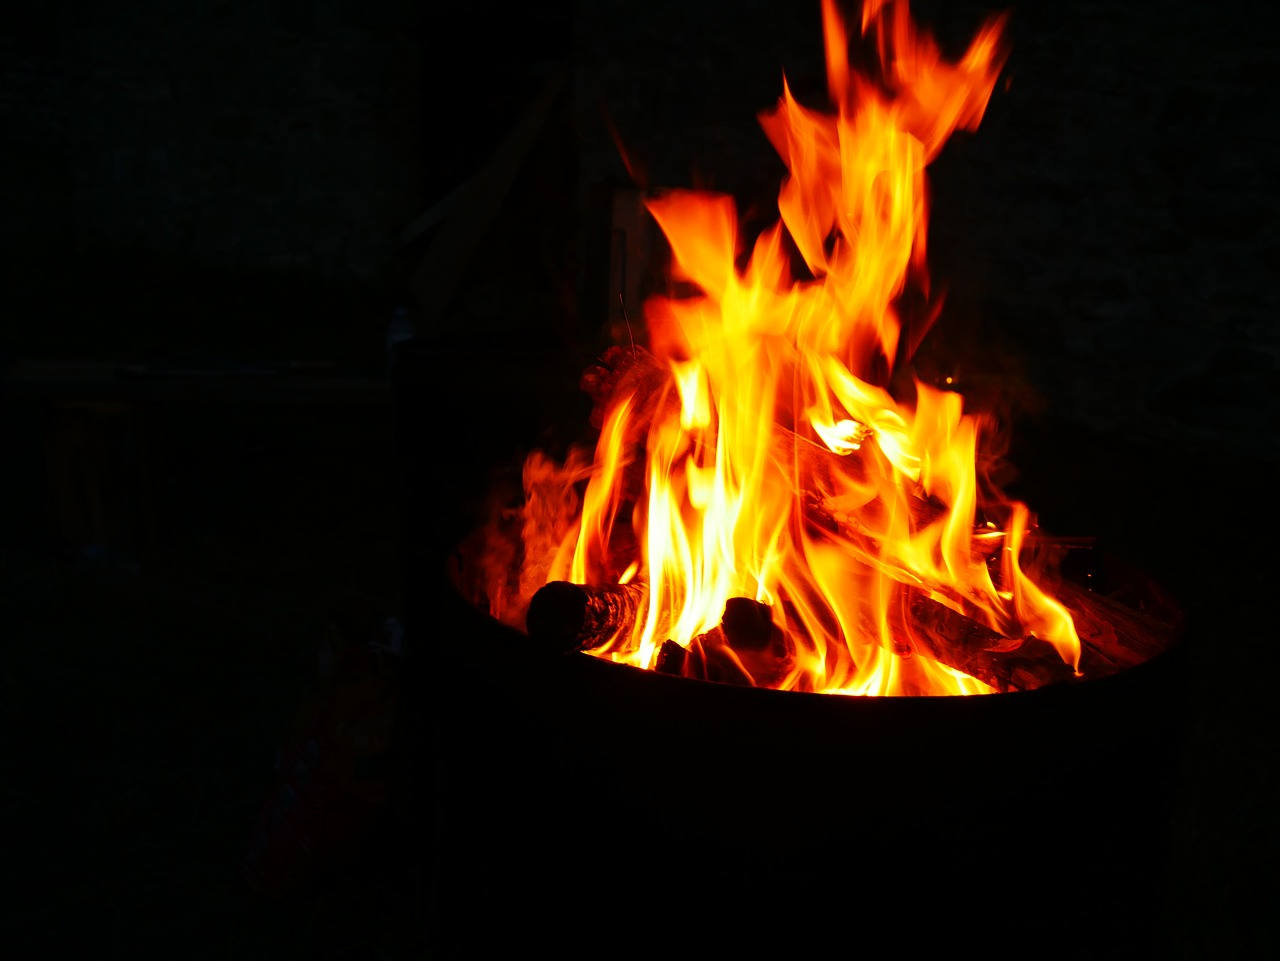 Pastor Enoch Adeboye of Redeemed Christian Church of God, Nigeria, Declares in Ireland: 'Fire Will Fall'